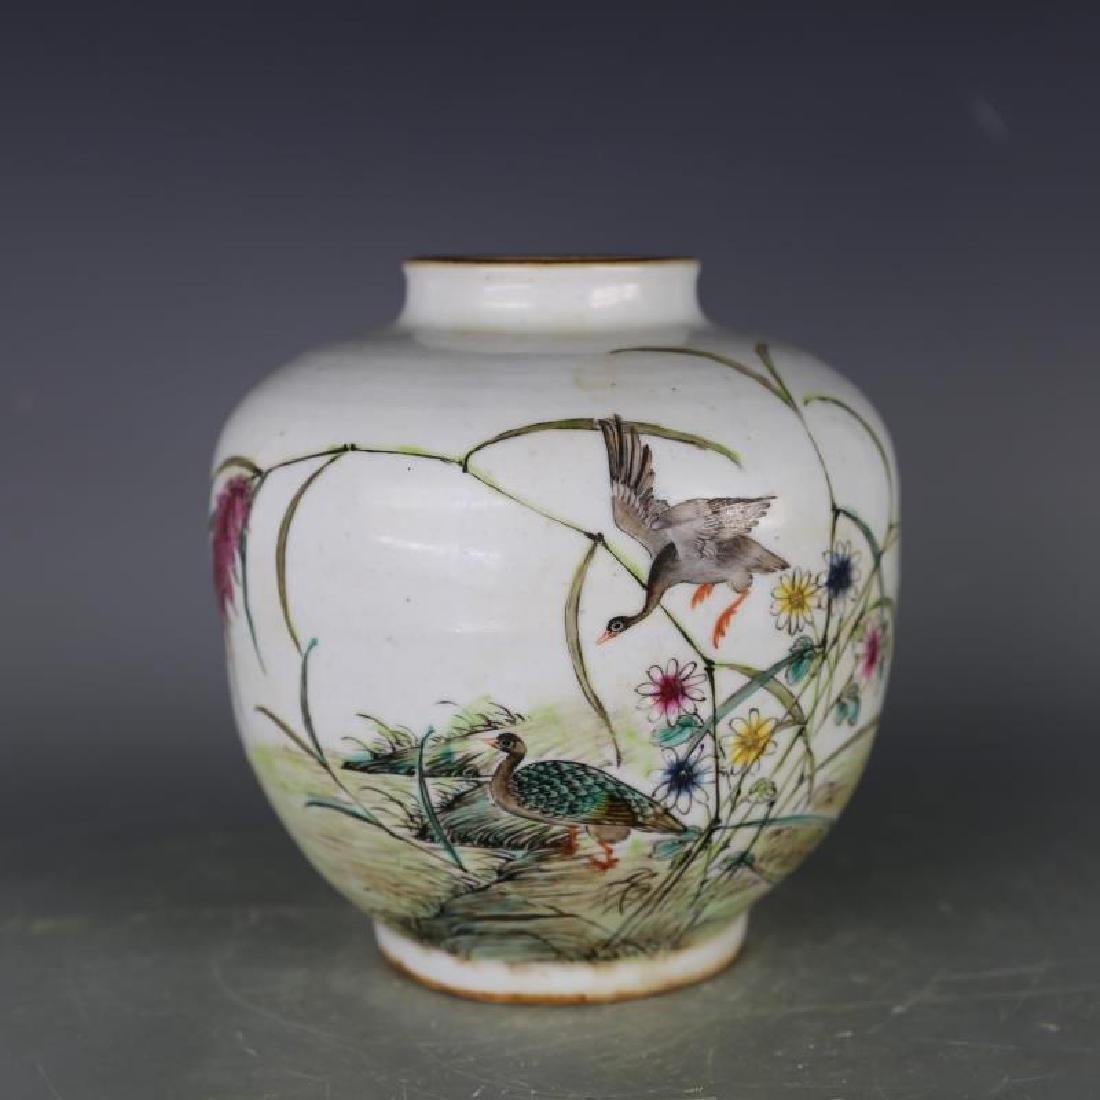 Chinese Qing Dynasty Famille-Rose Porcelain Jar